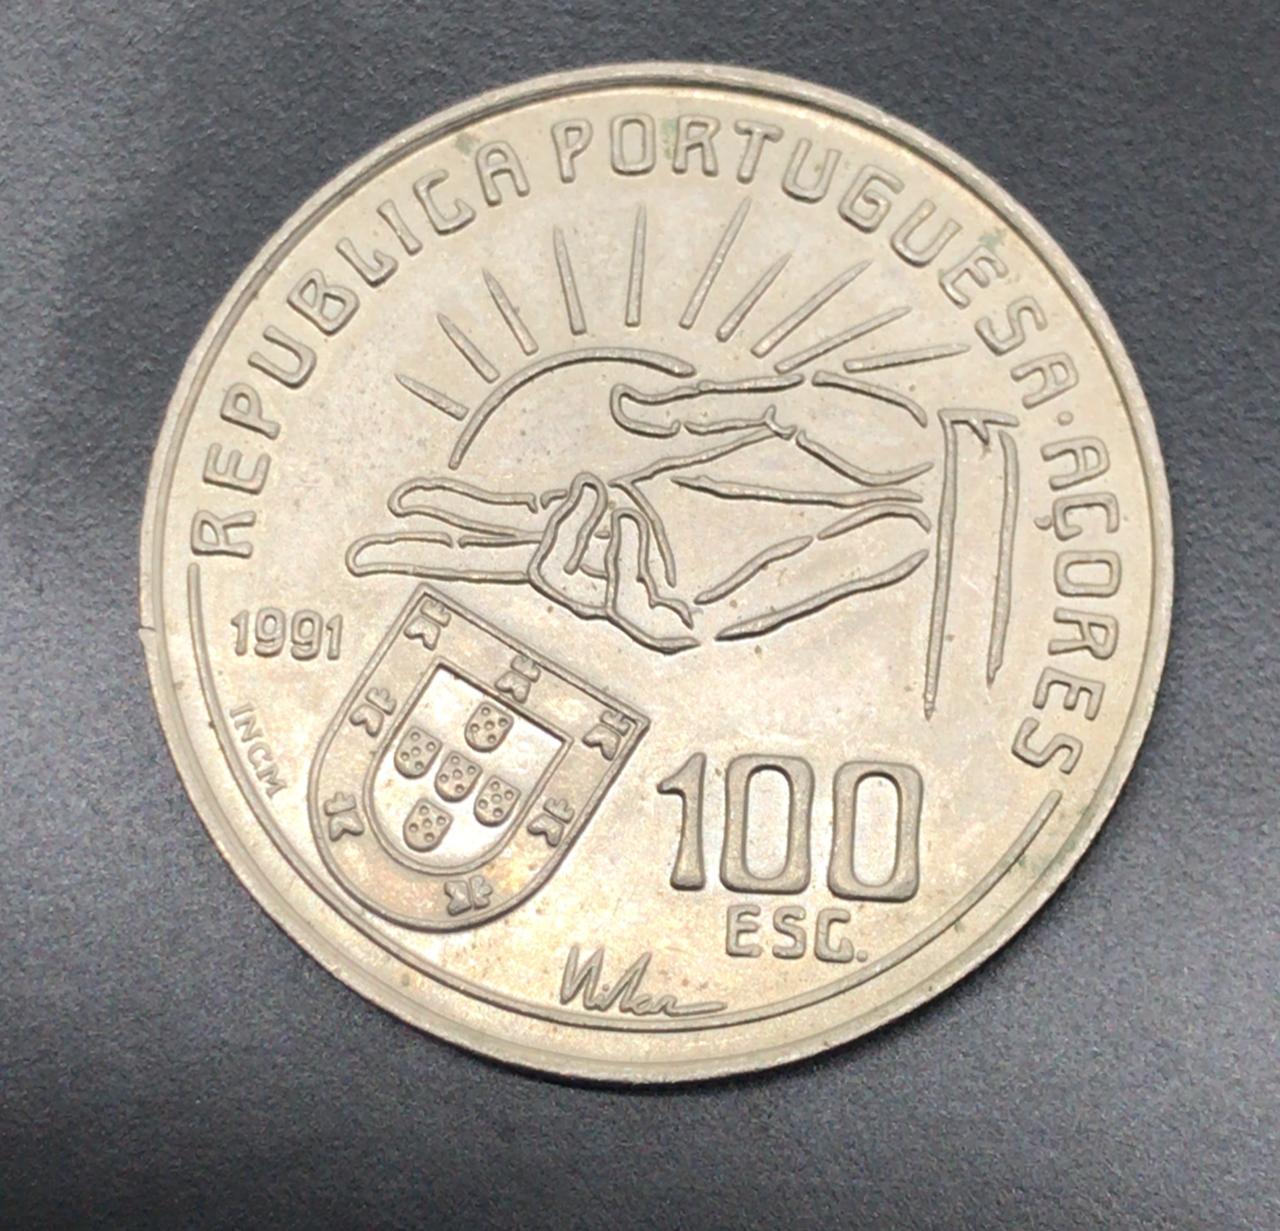 Moeda de Portugal 100 Escudos Antero de Quental